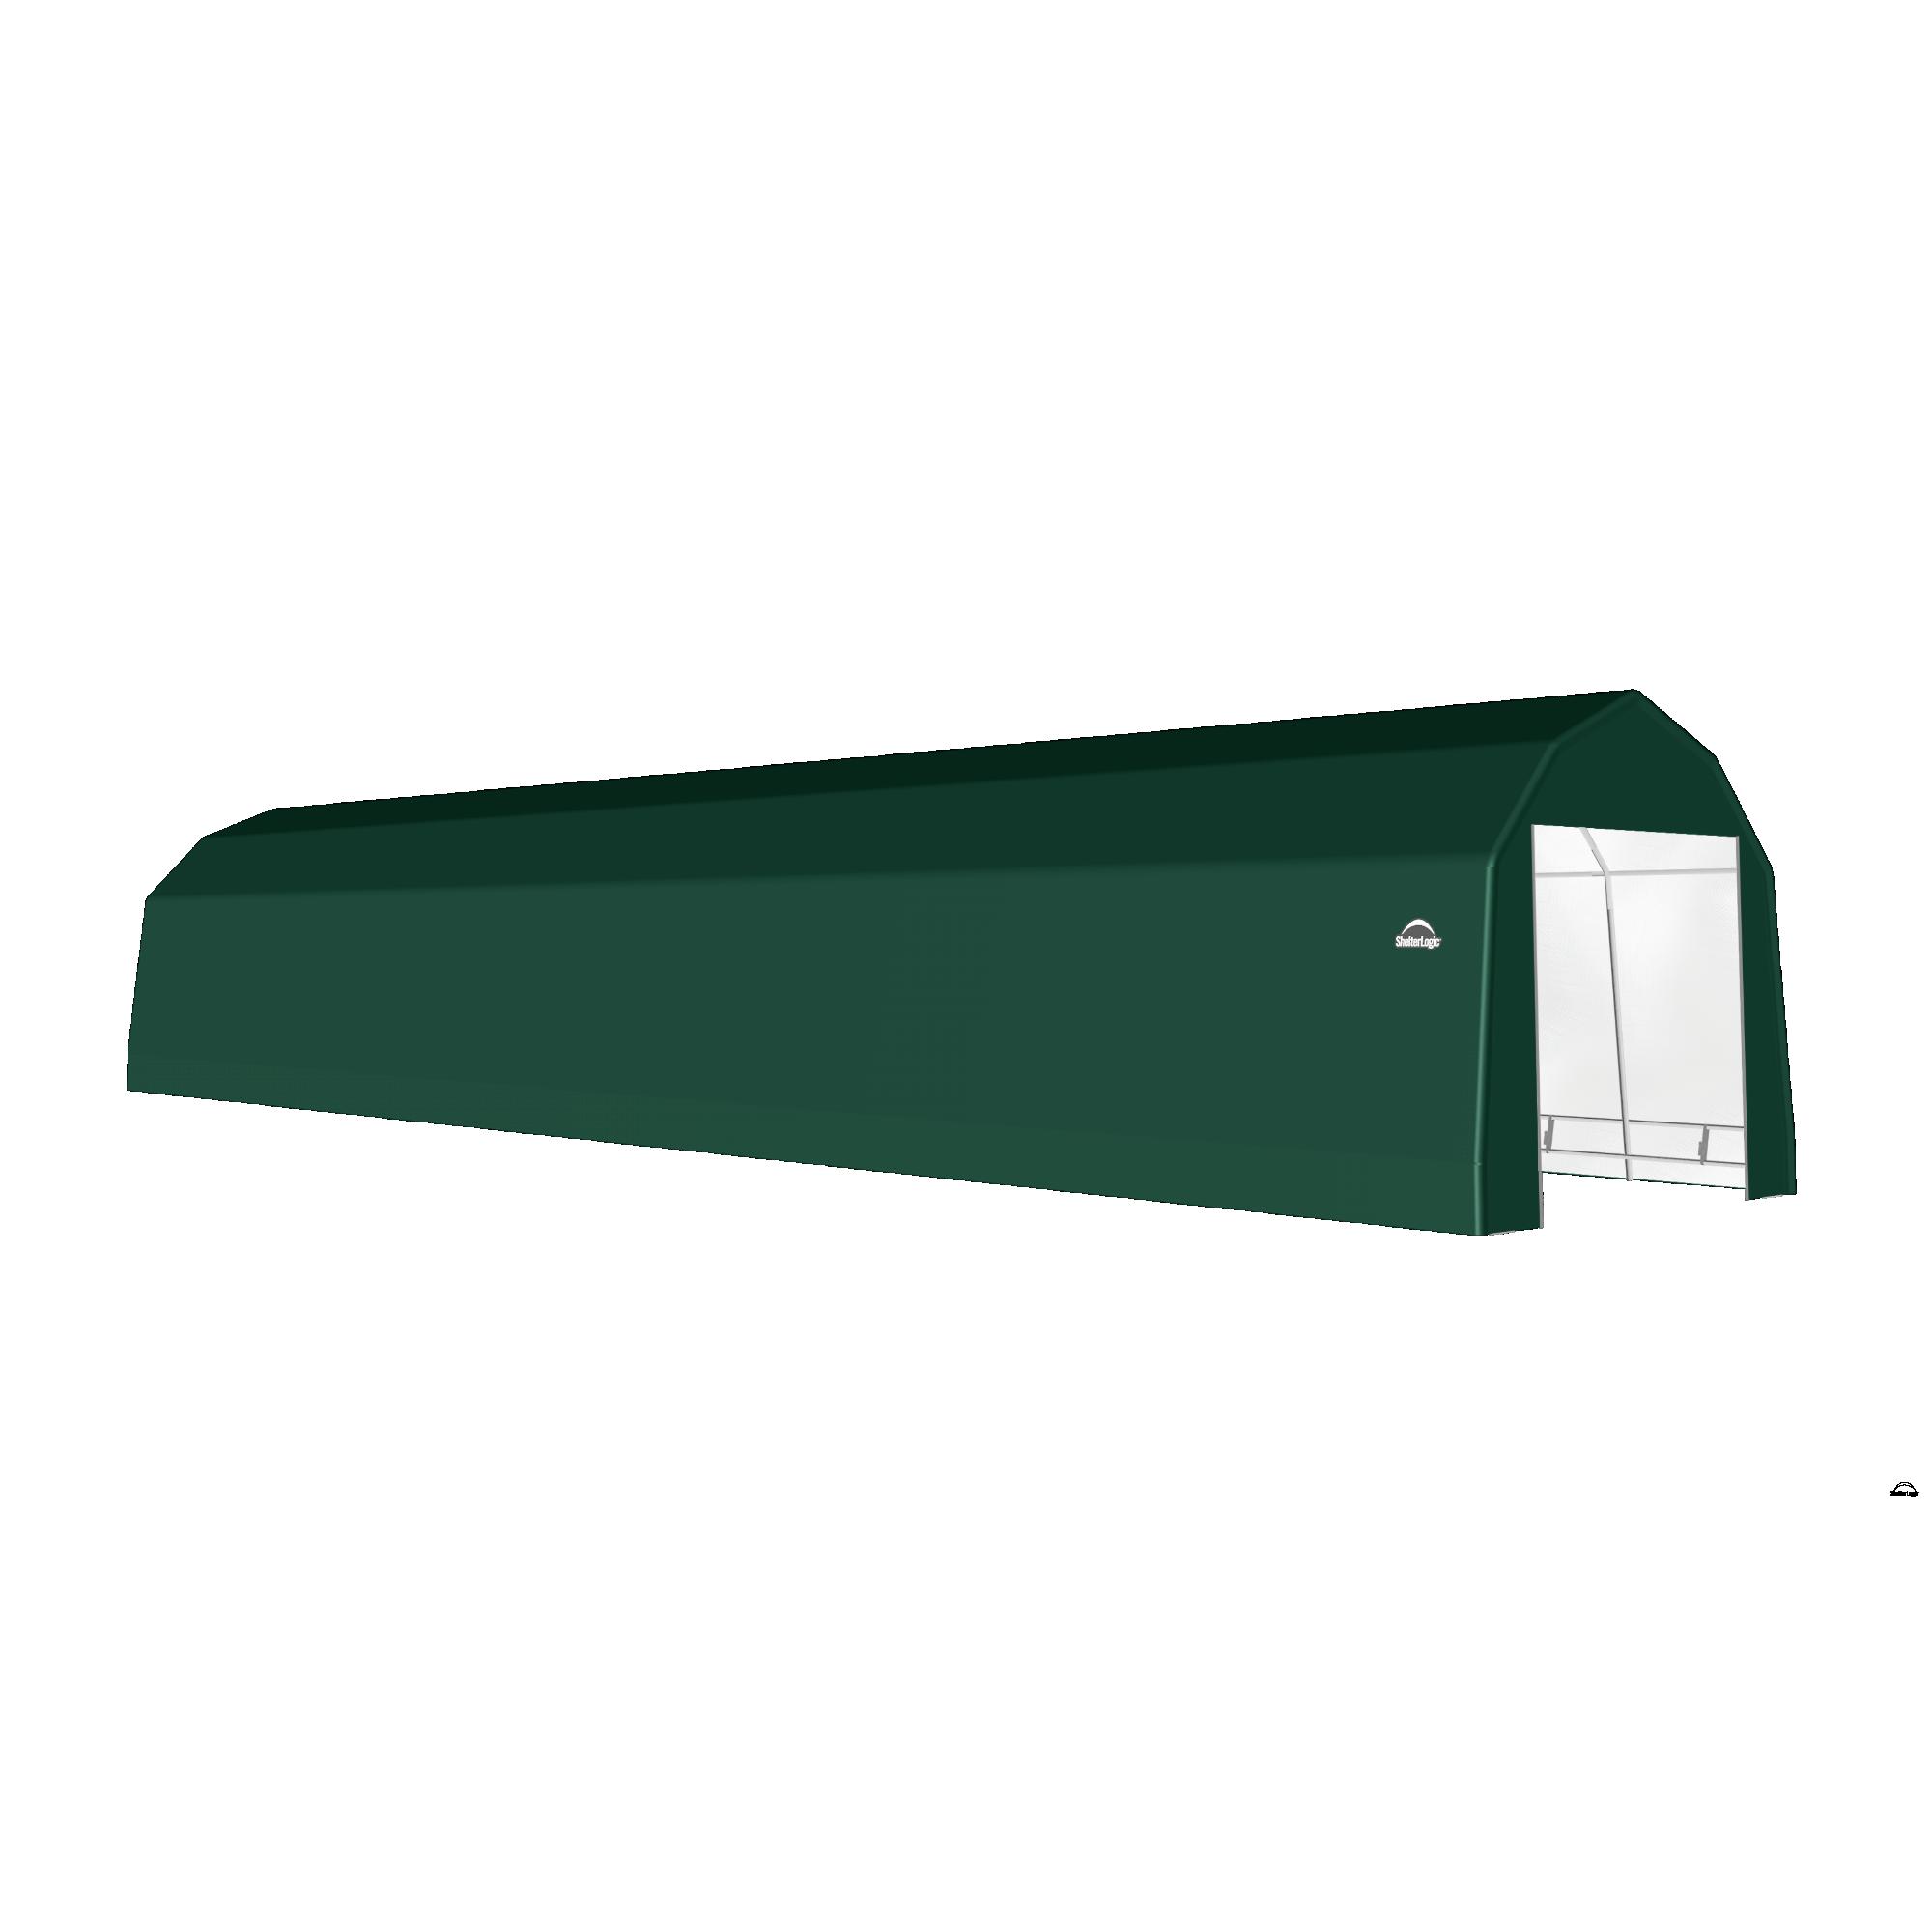 SP Barn 12X64X11 Green 14 oz PE Shelter